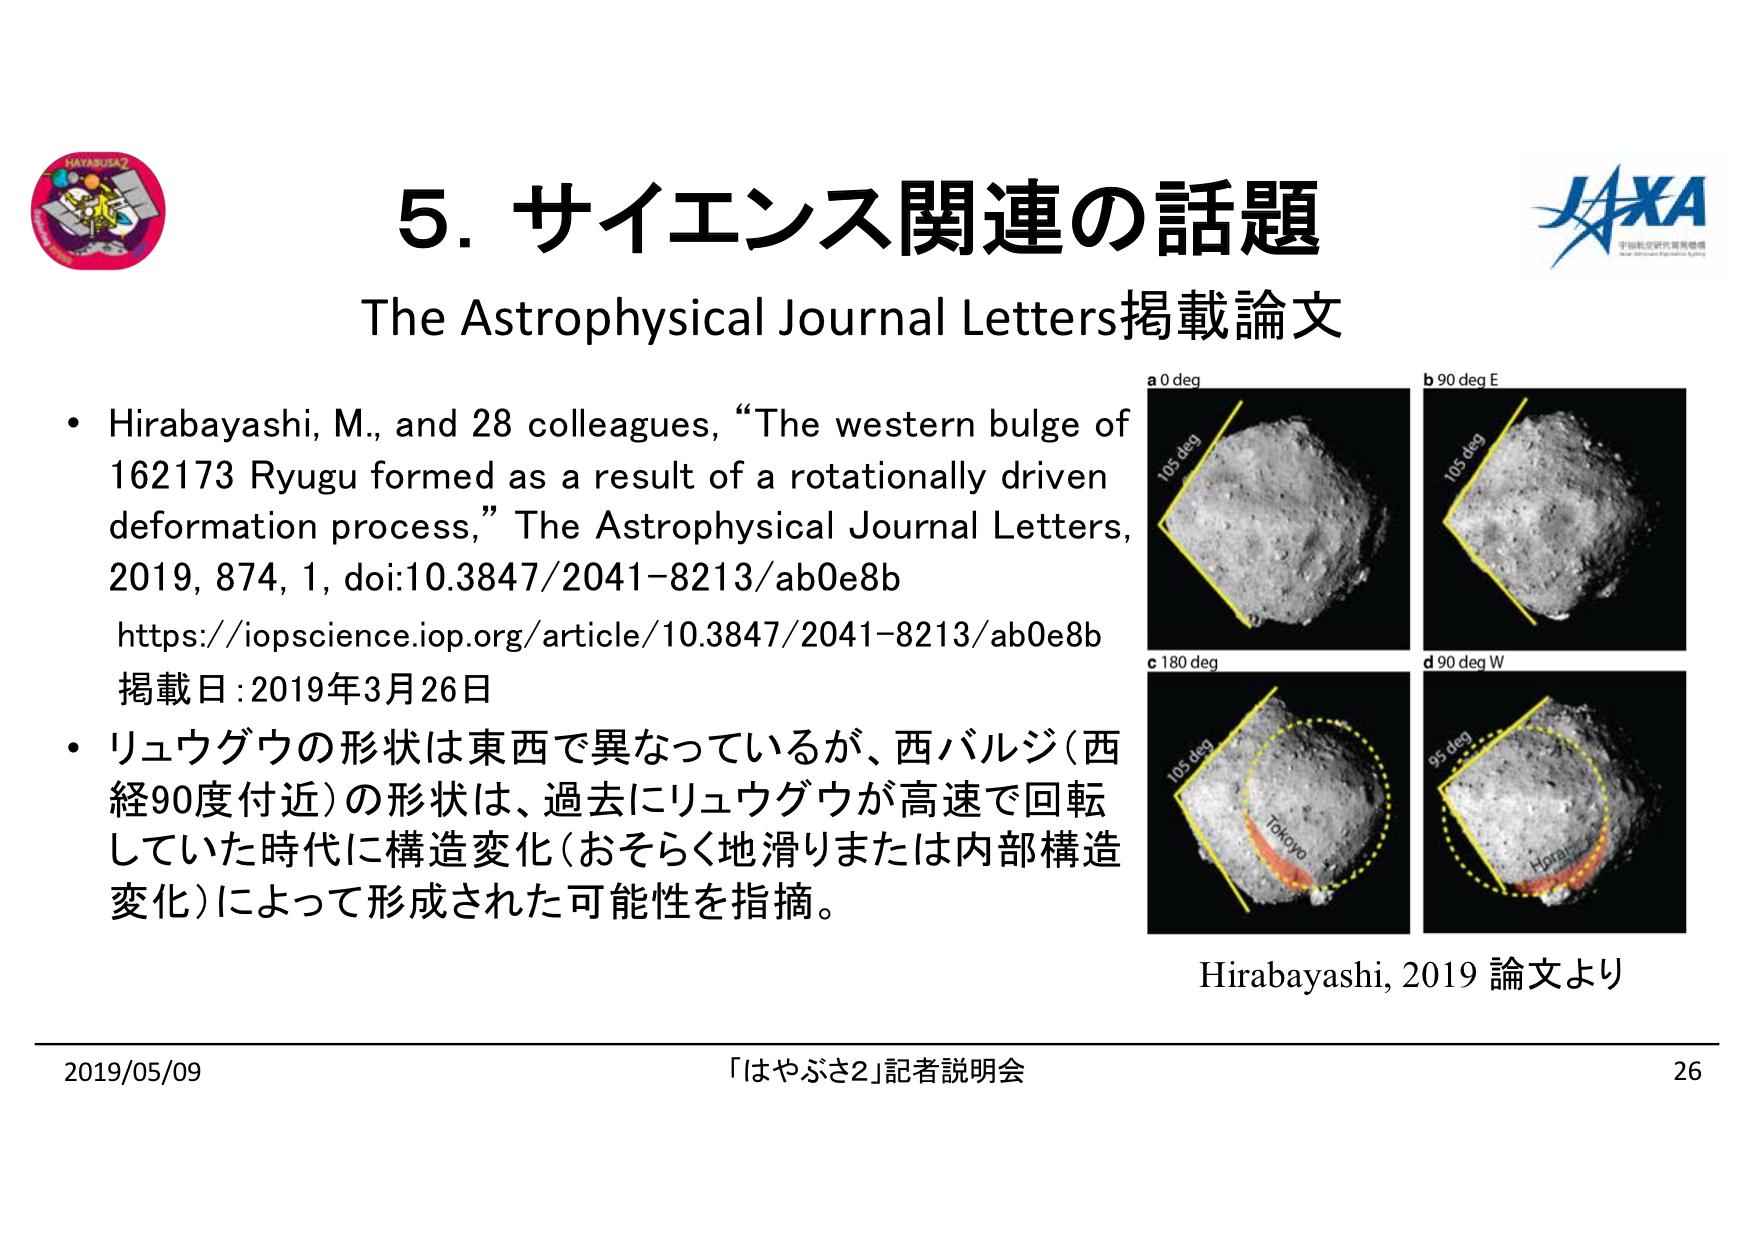 f:id:Imamura:20190509154422p:plain